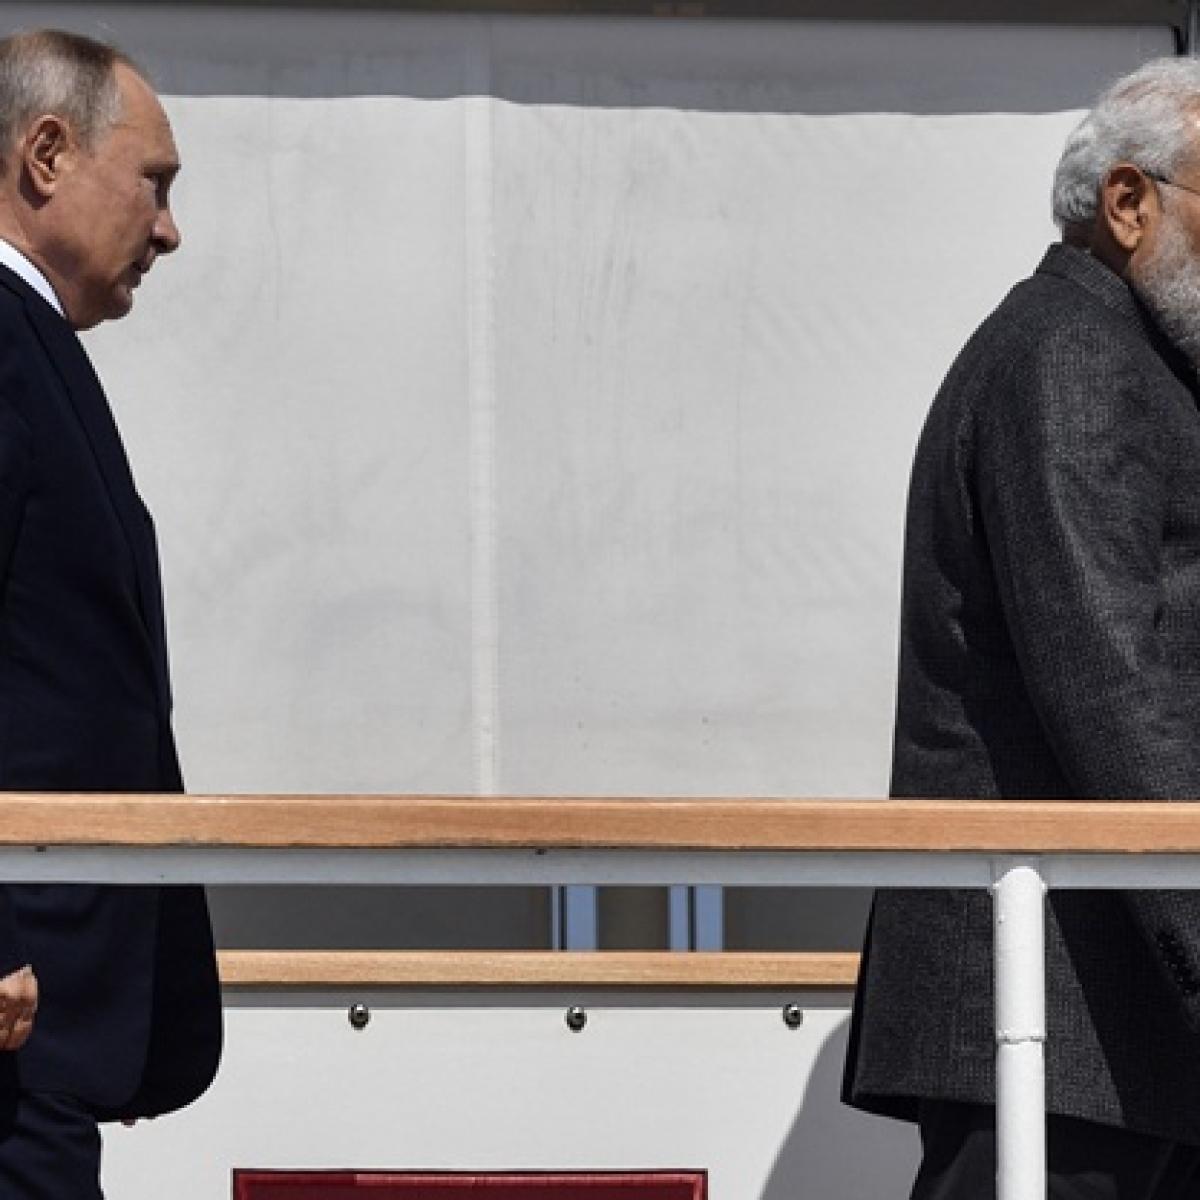 PM Narendra Modi visits Zvezda shipbuilding complex along with President Vladimir Putin